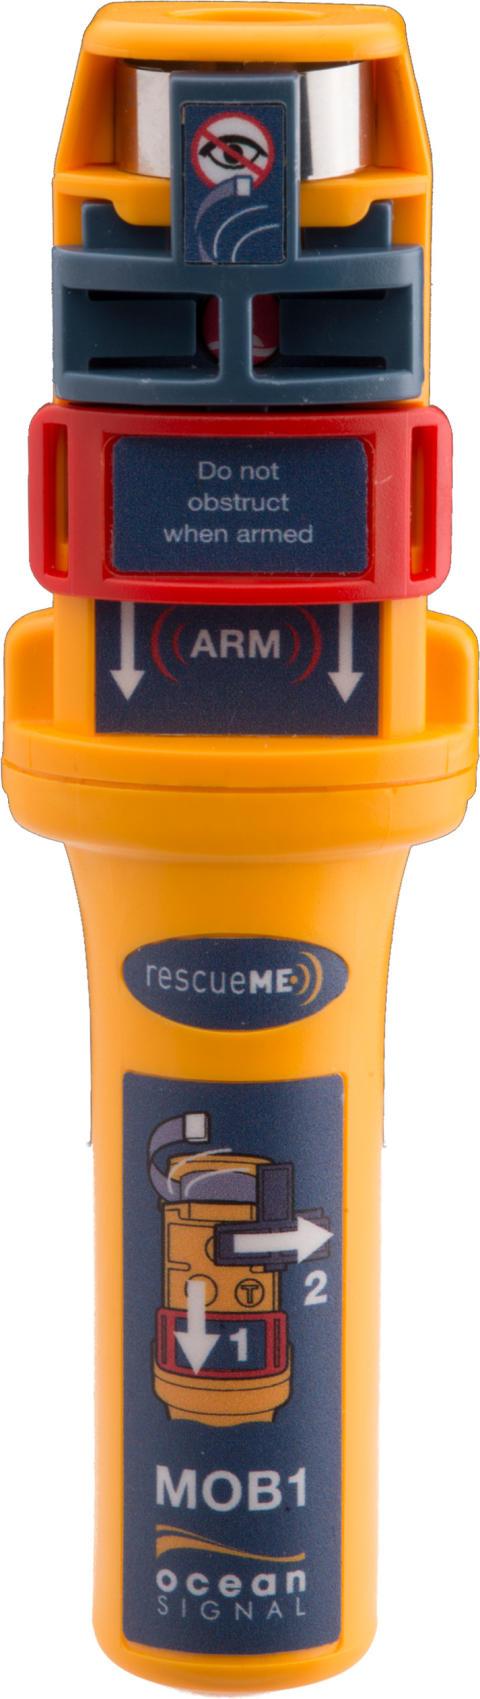 Hi-res image - Ocean Signal - Ocean Signal rescueME MOB1